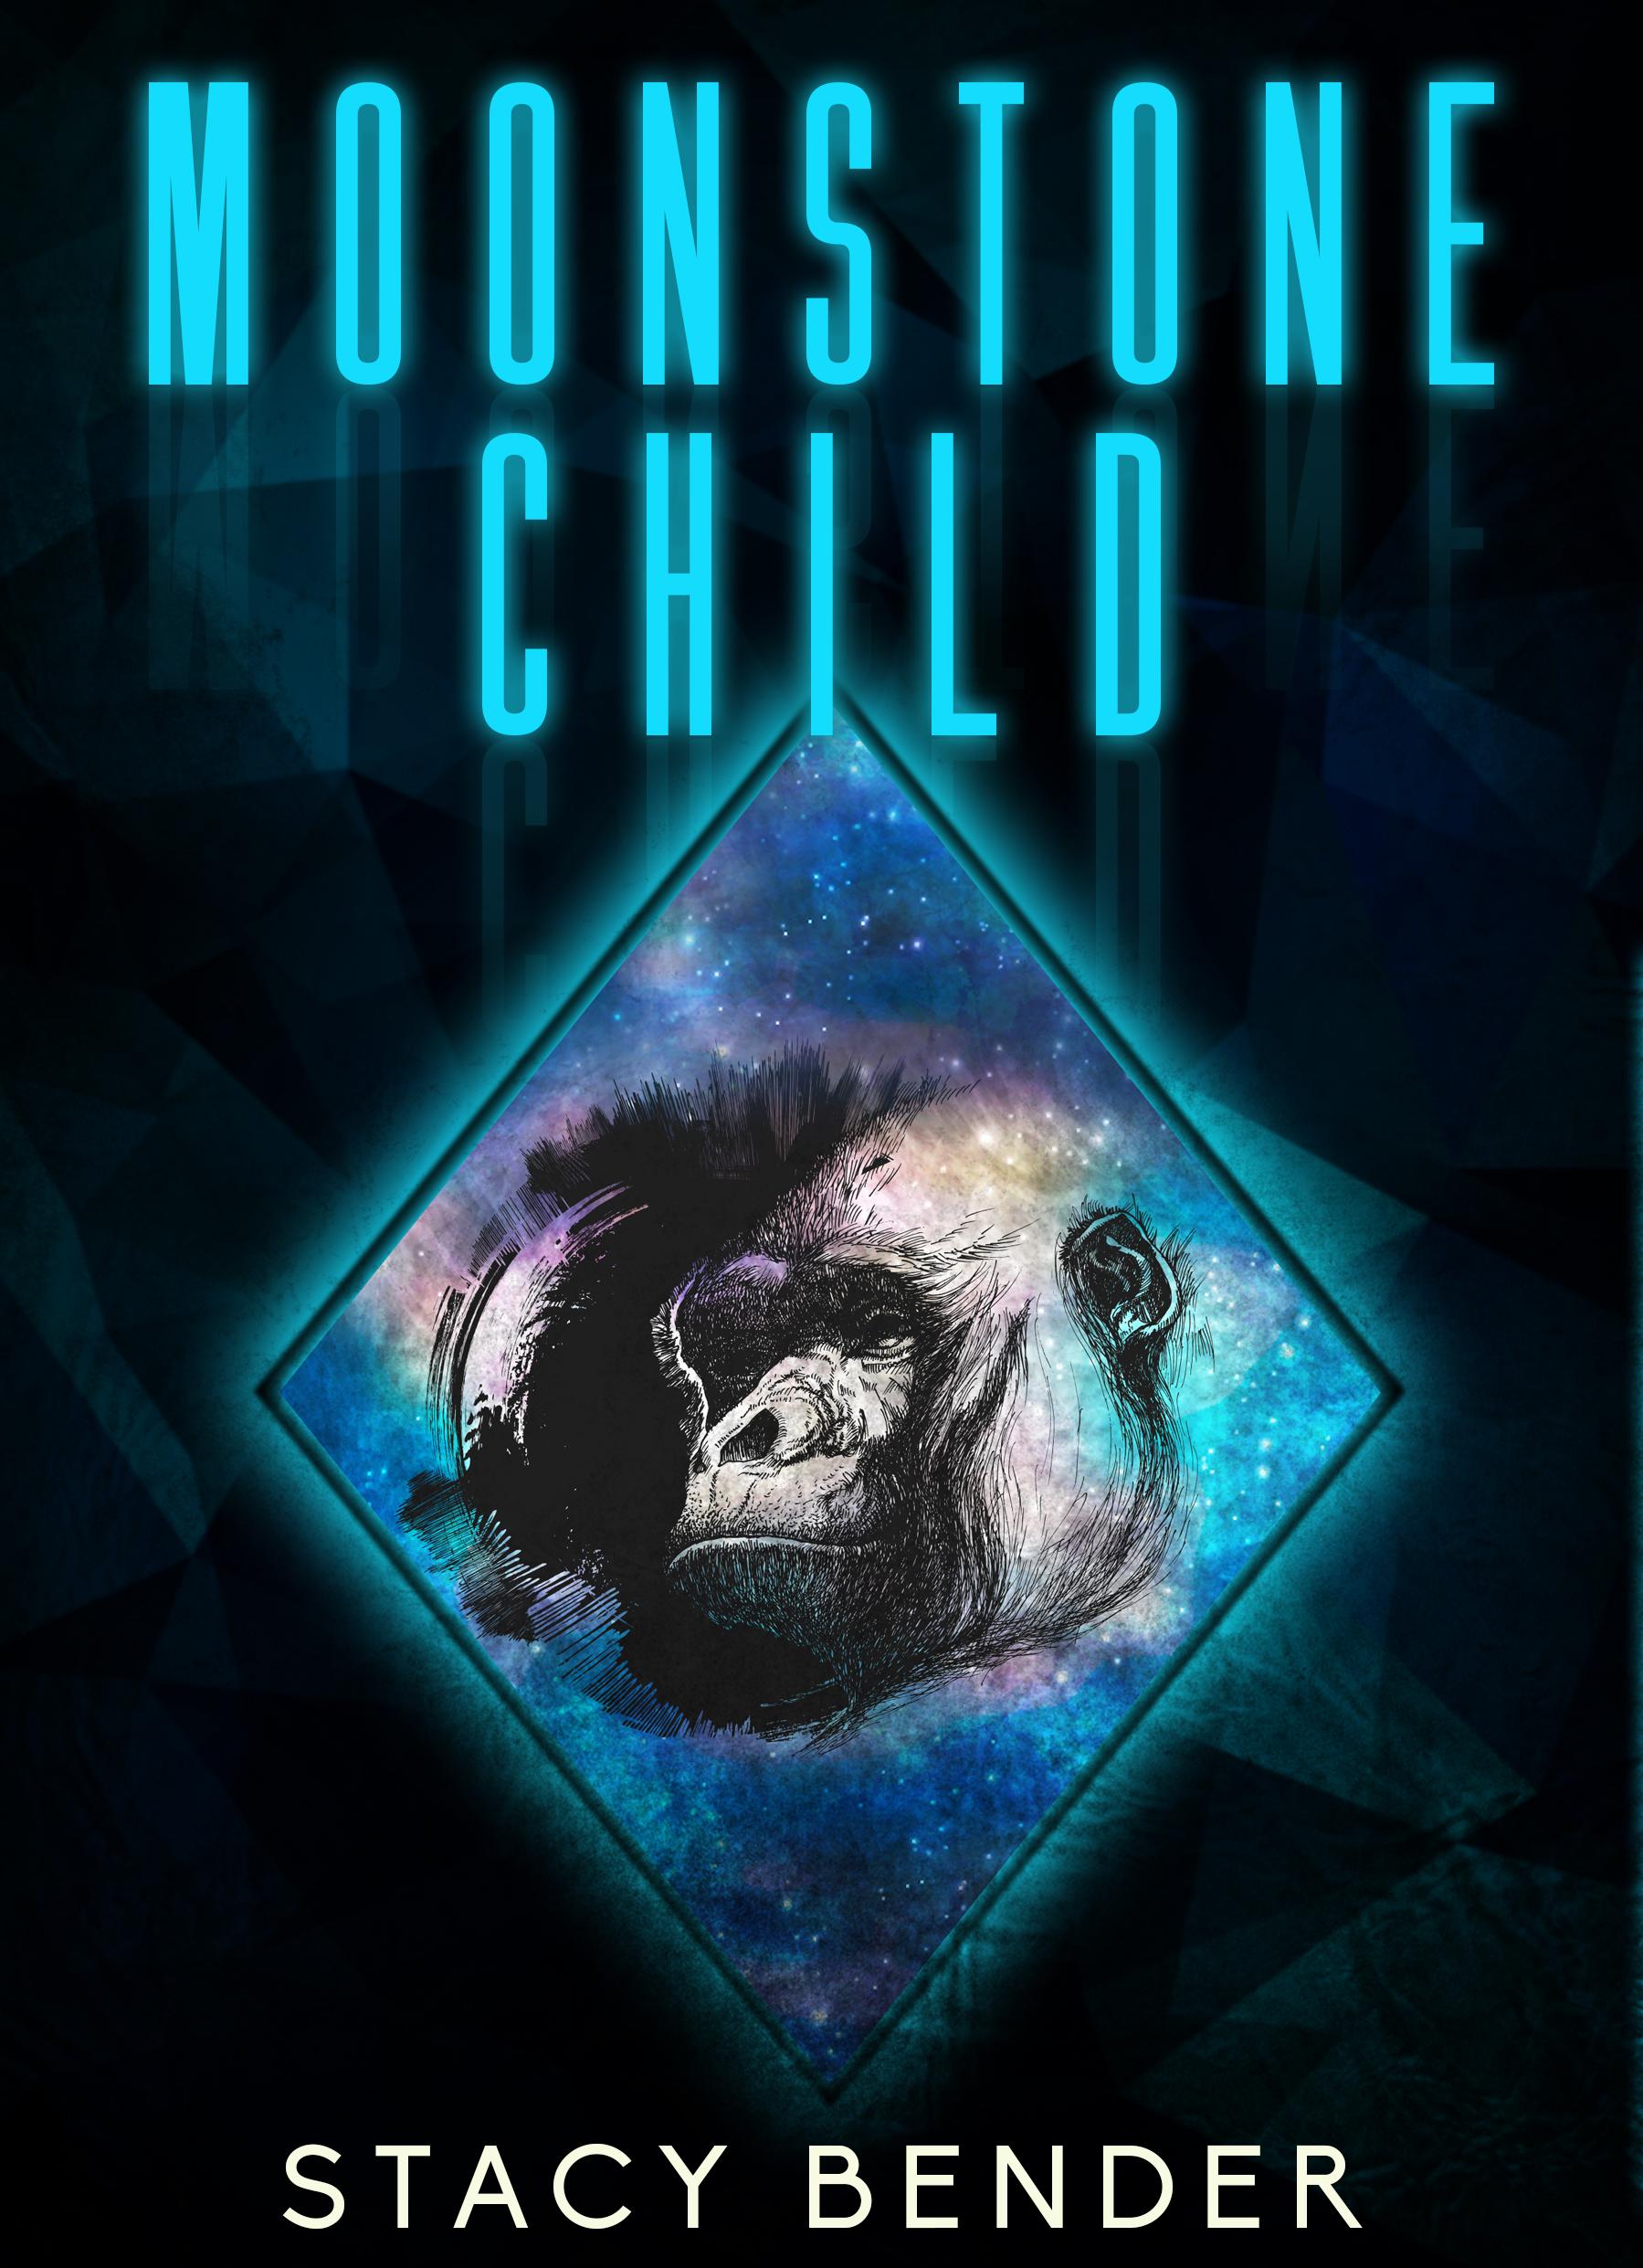 Moonstone Child